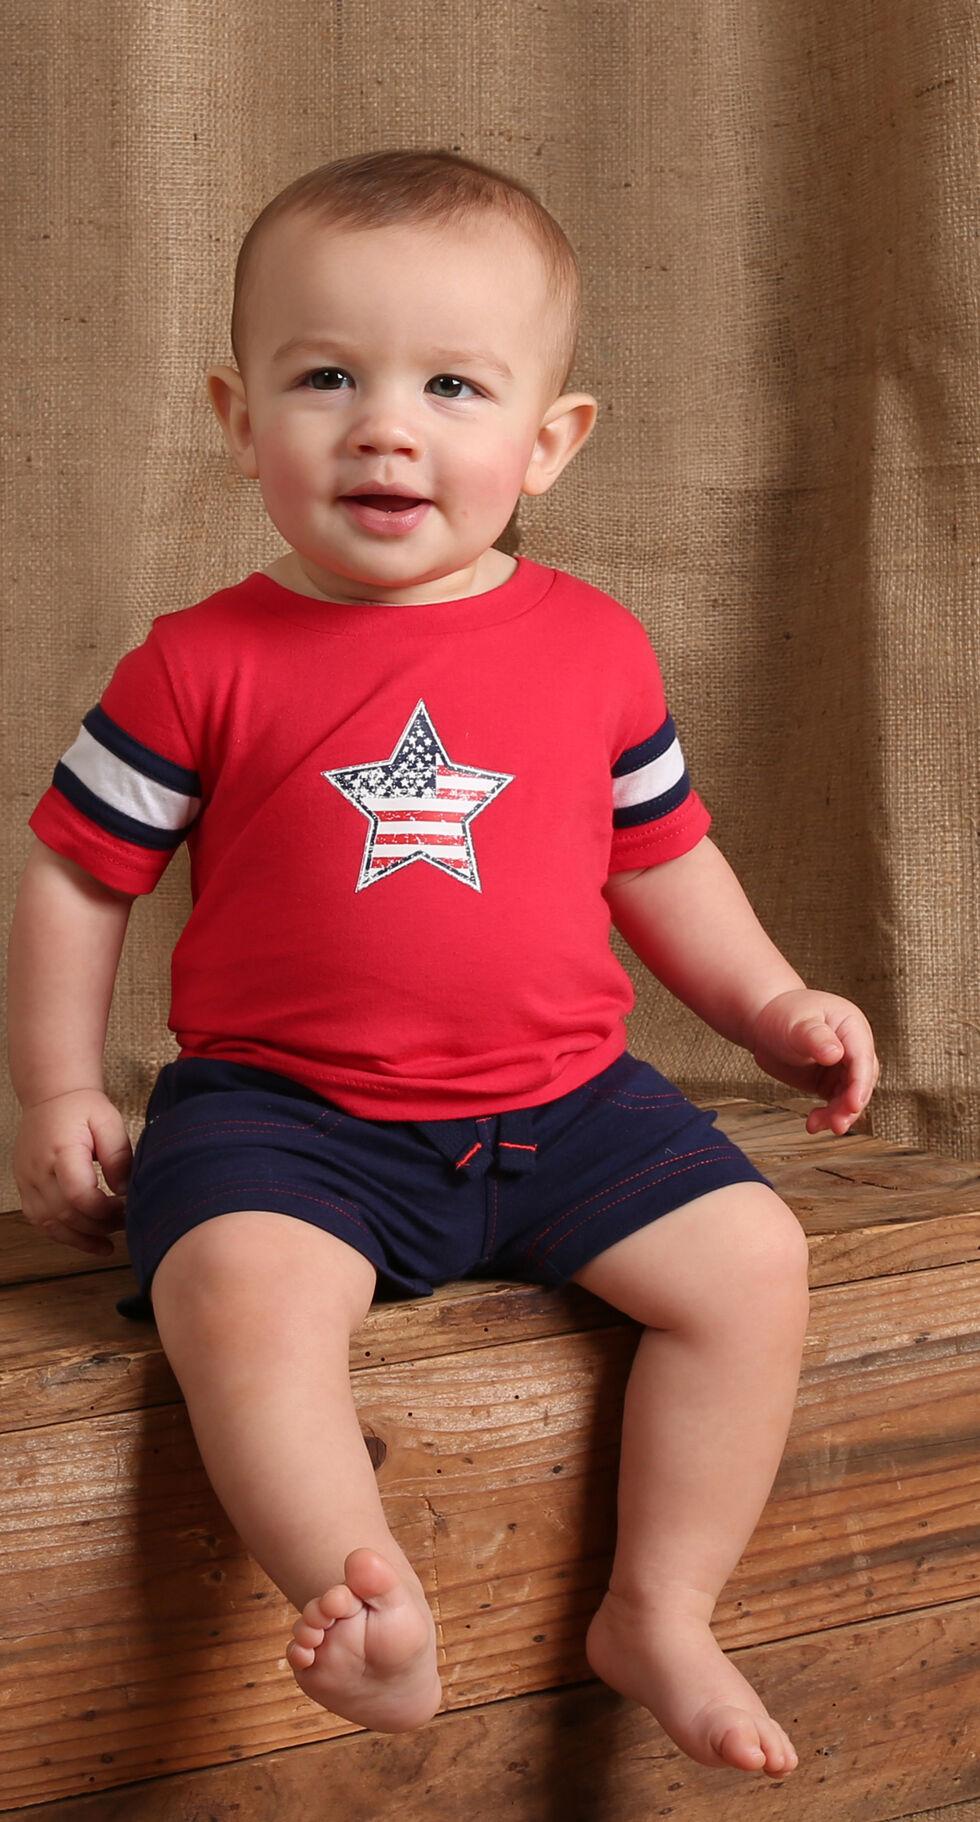 Wrangler Toddler Boys' Red Star Short Sleeve Tee (2T-4T), Red, hi-res